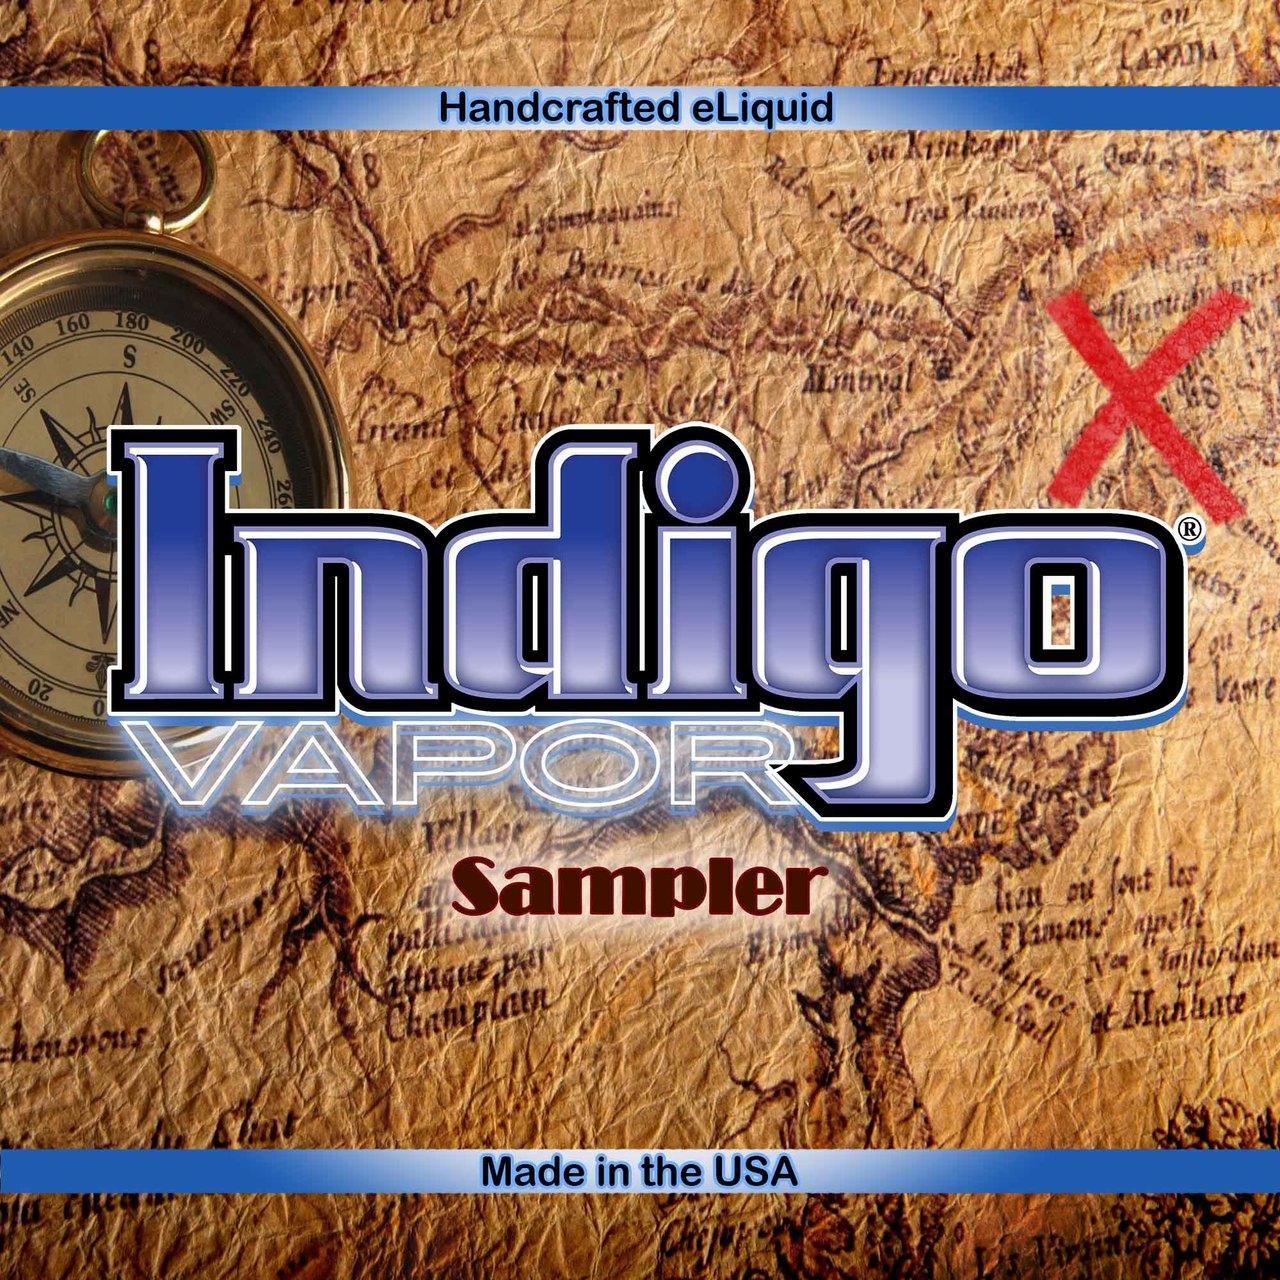 Indigo Sampler